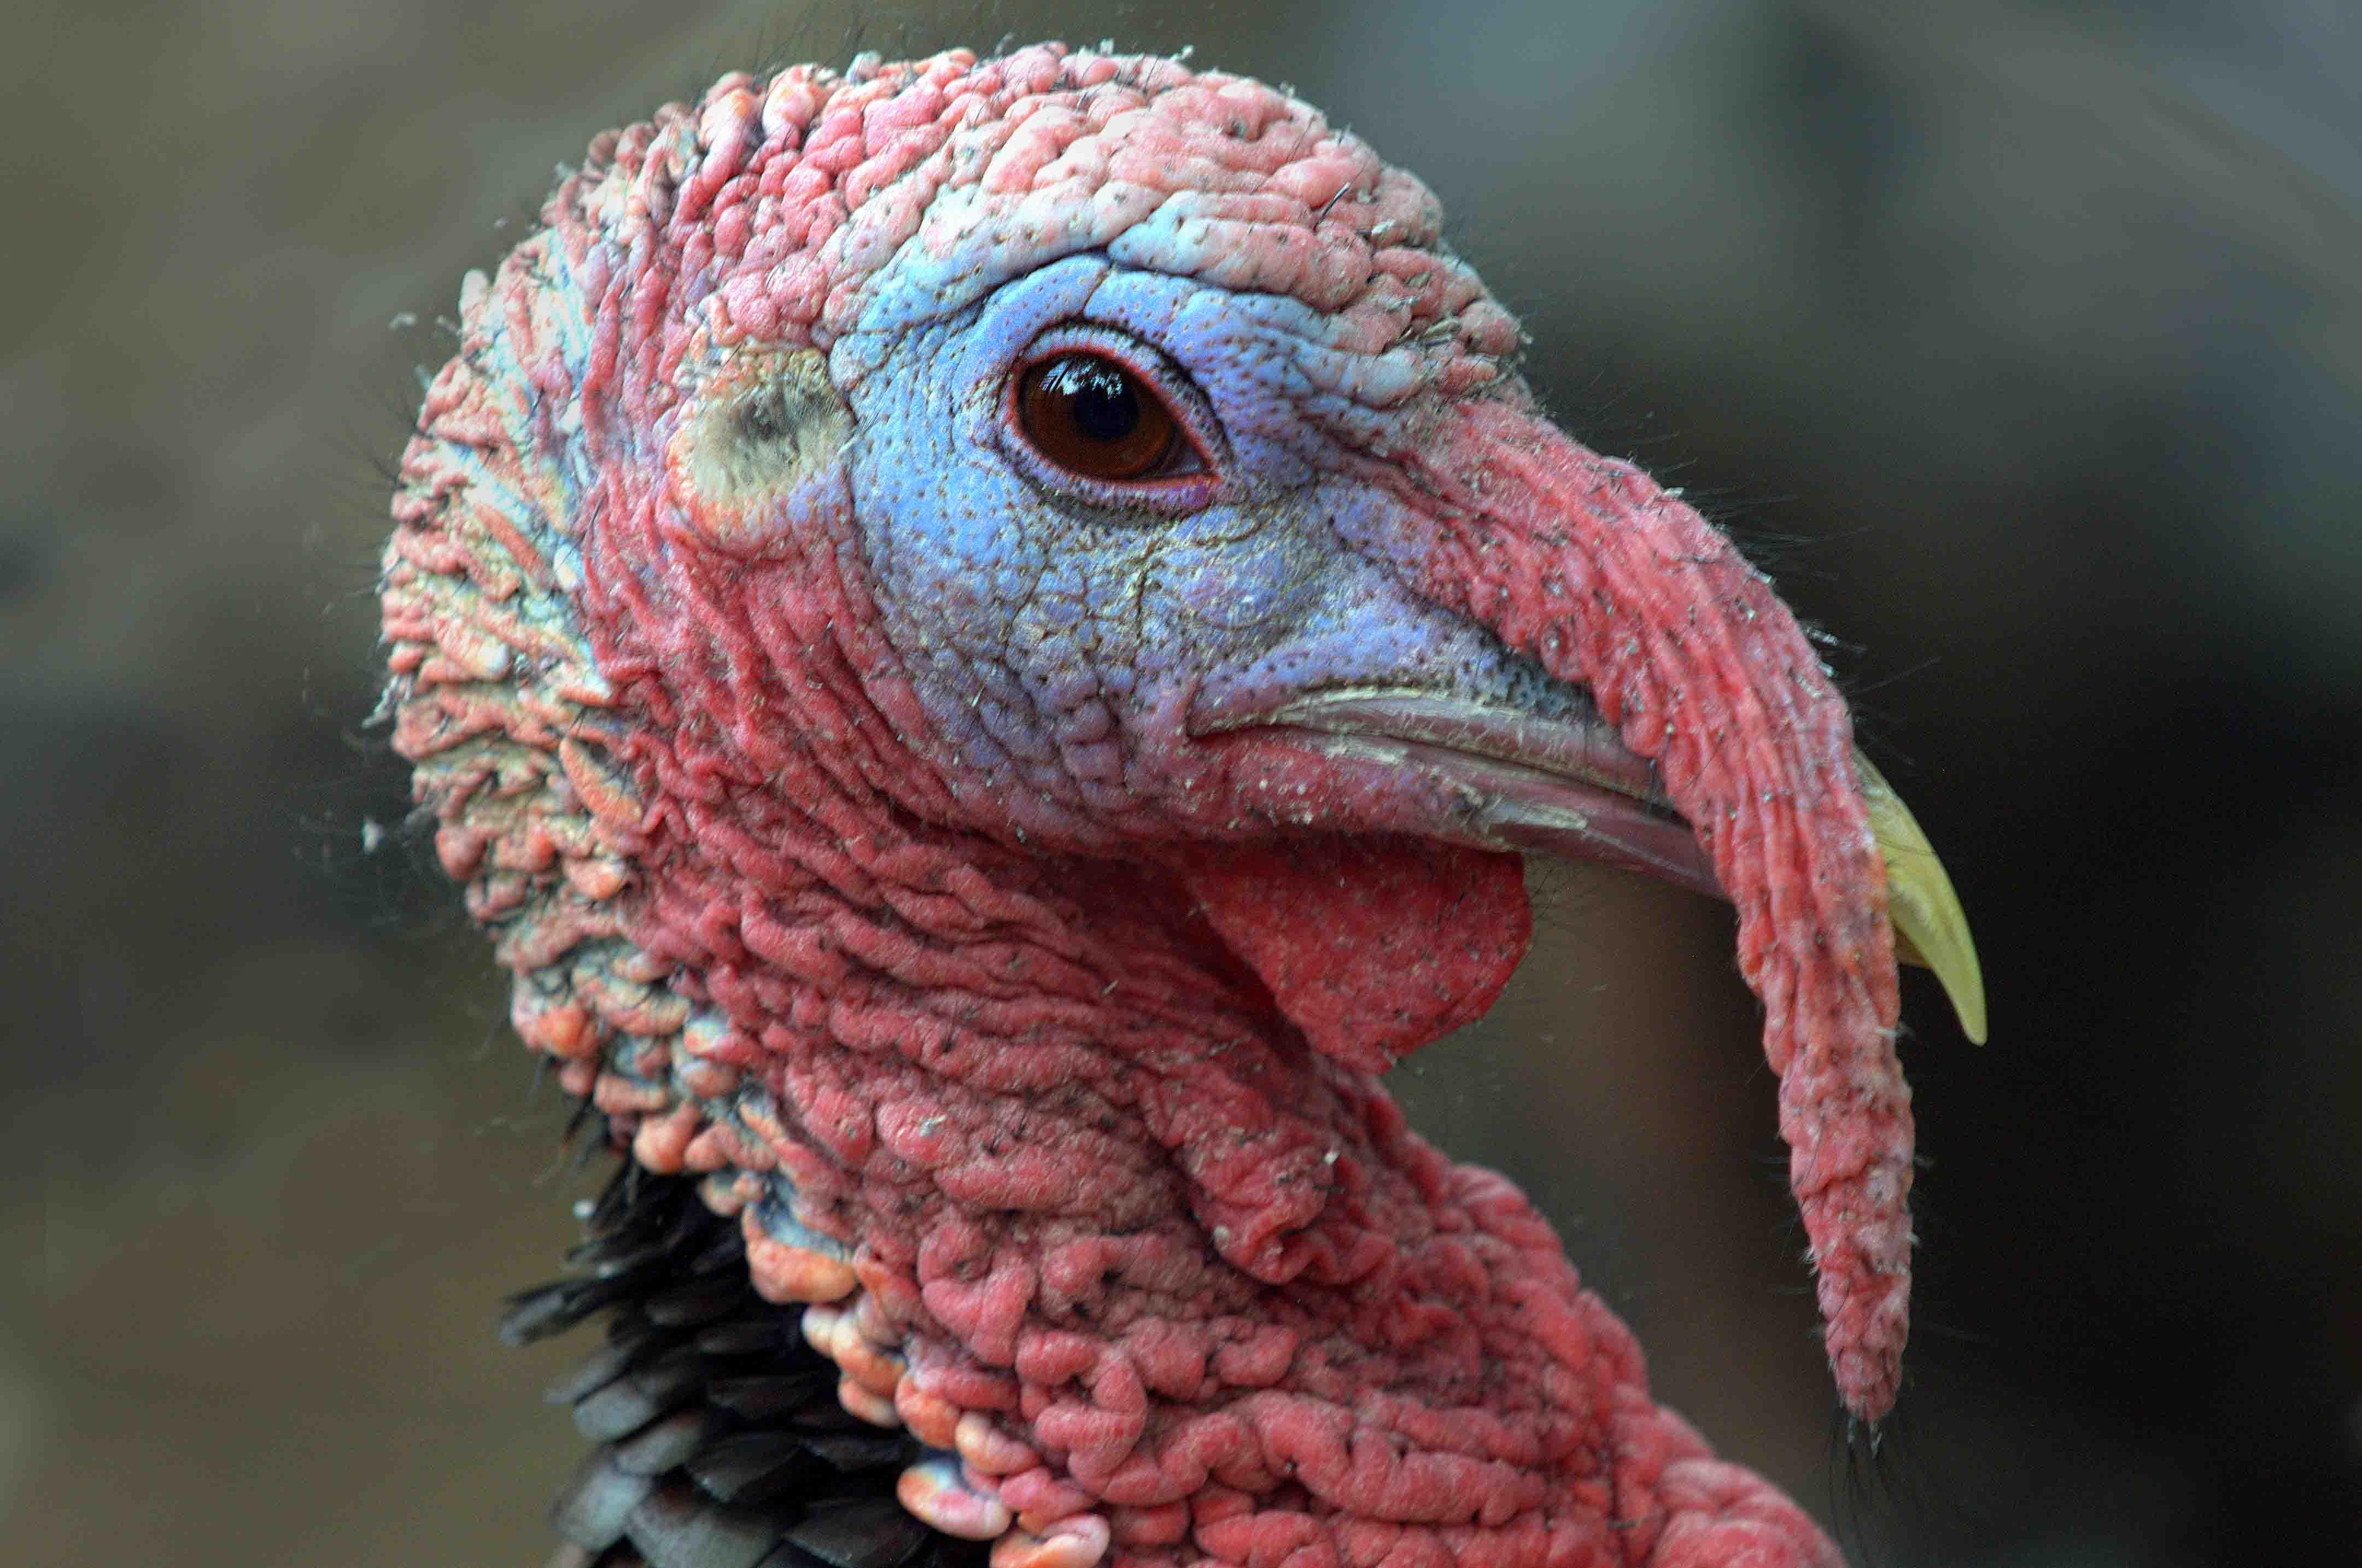 Wild Turkey_CheyenneMtnZoo-CO_LAH_2224